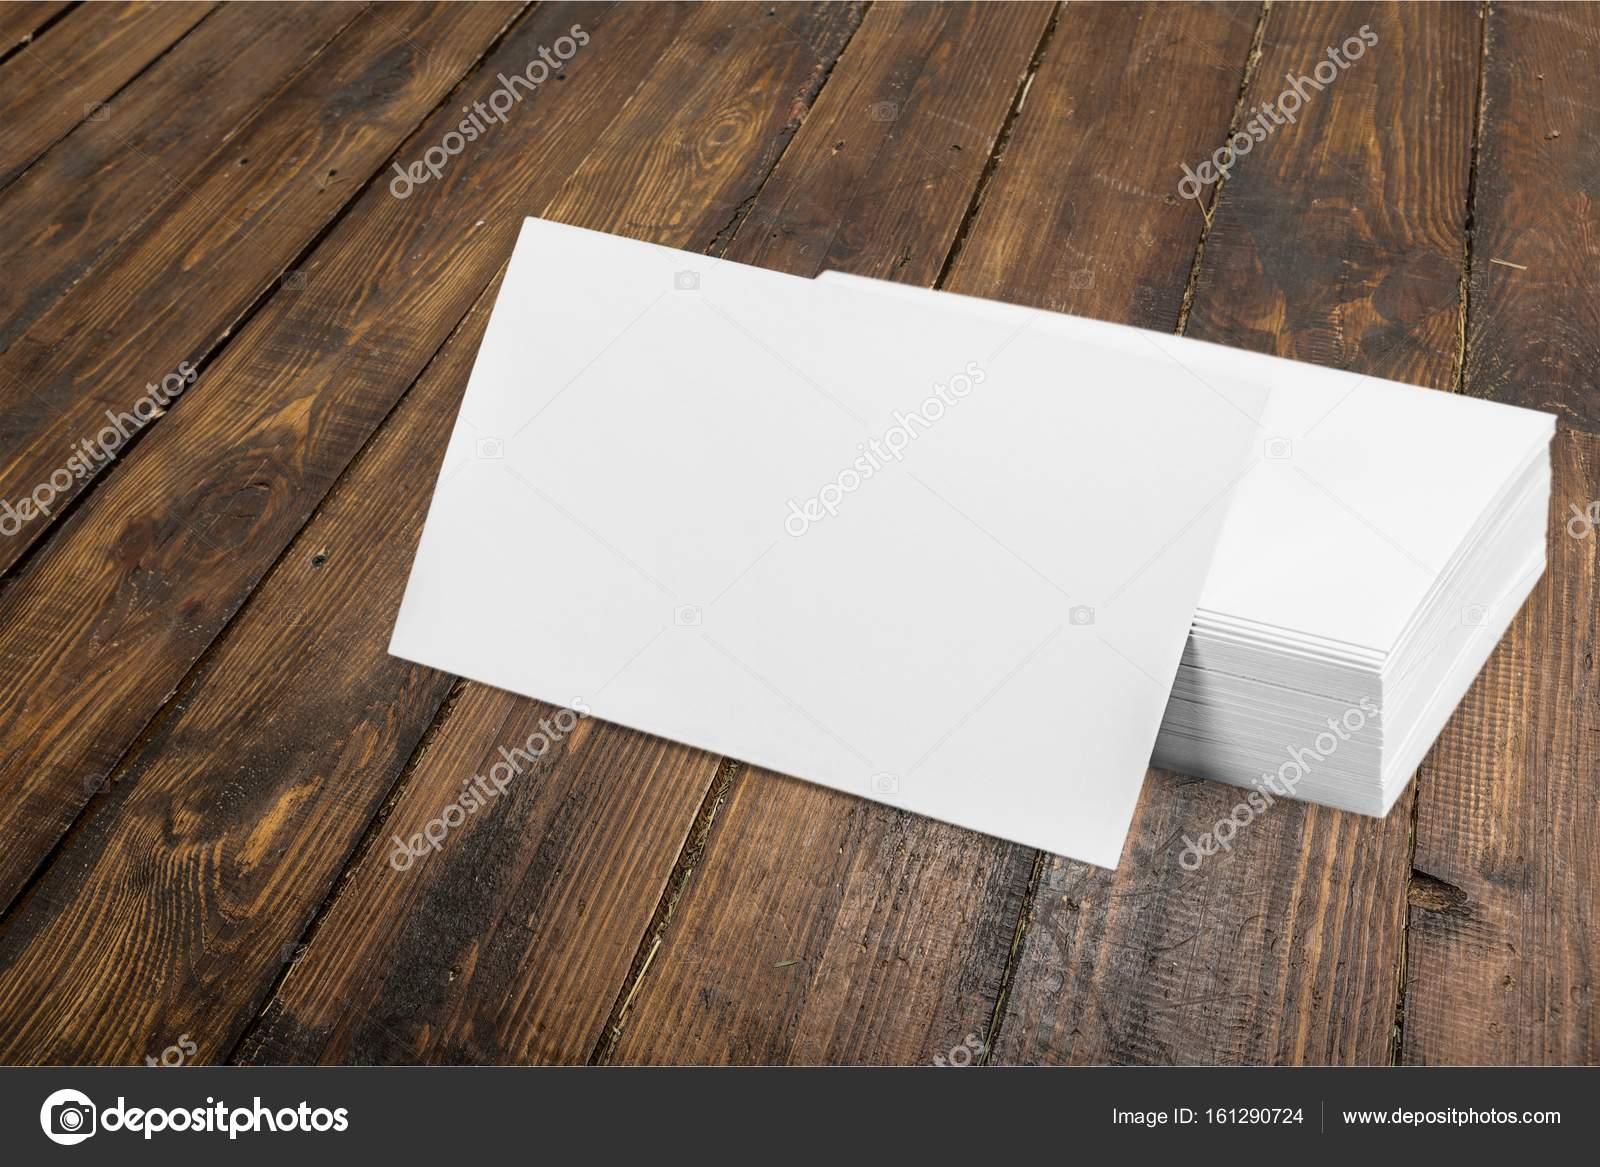 blank business cards — Stock Photo © billiondigital #161290724